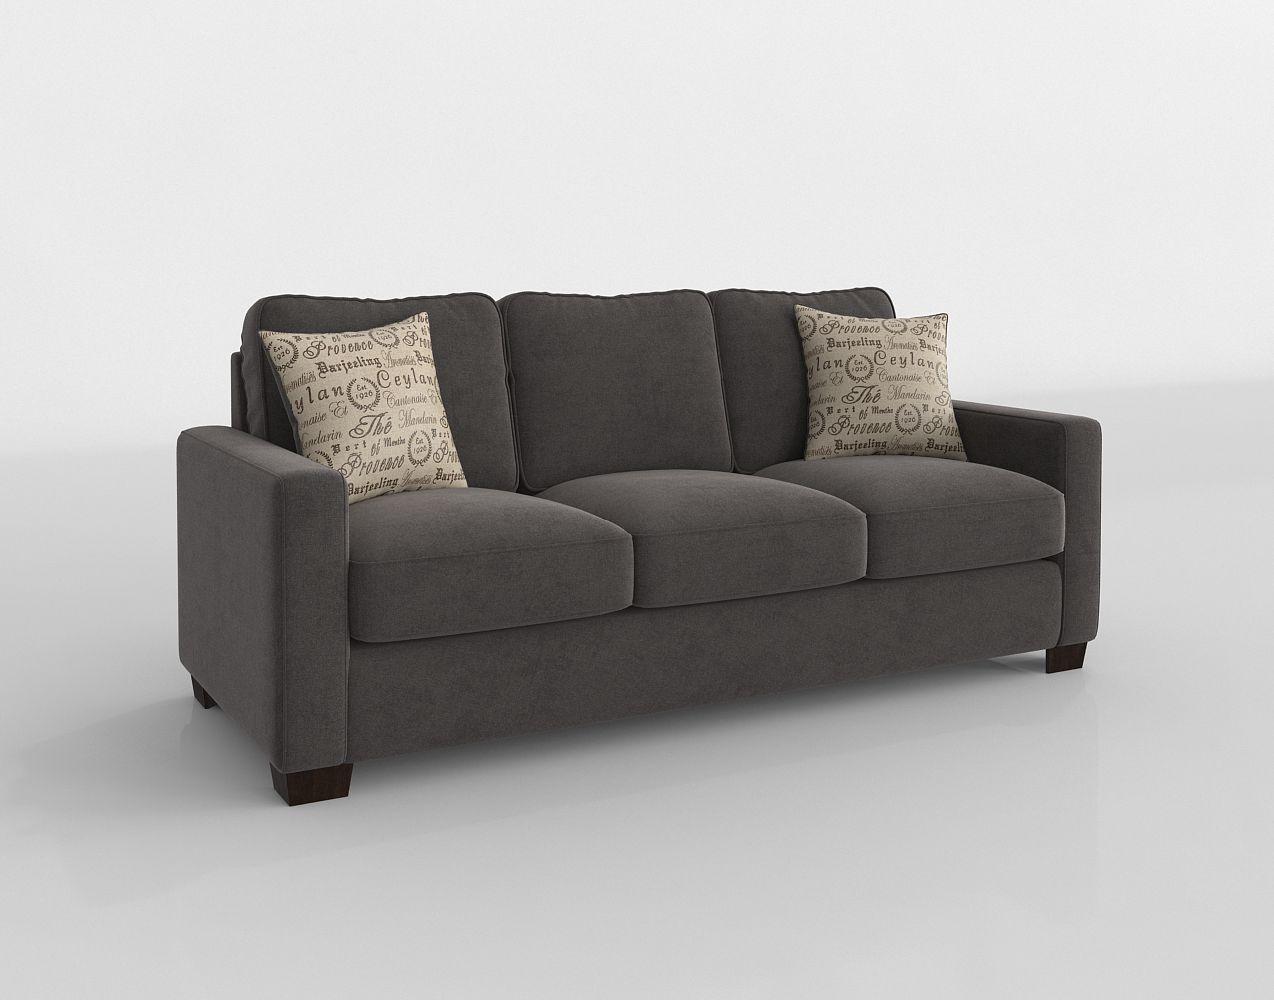 Alenya Collection Sofa Wyckes Furniture Glancing Eye